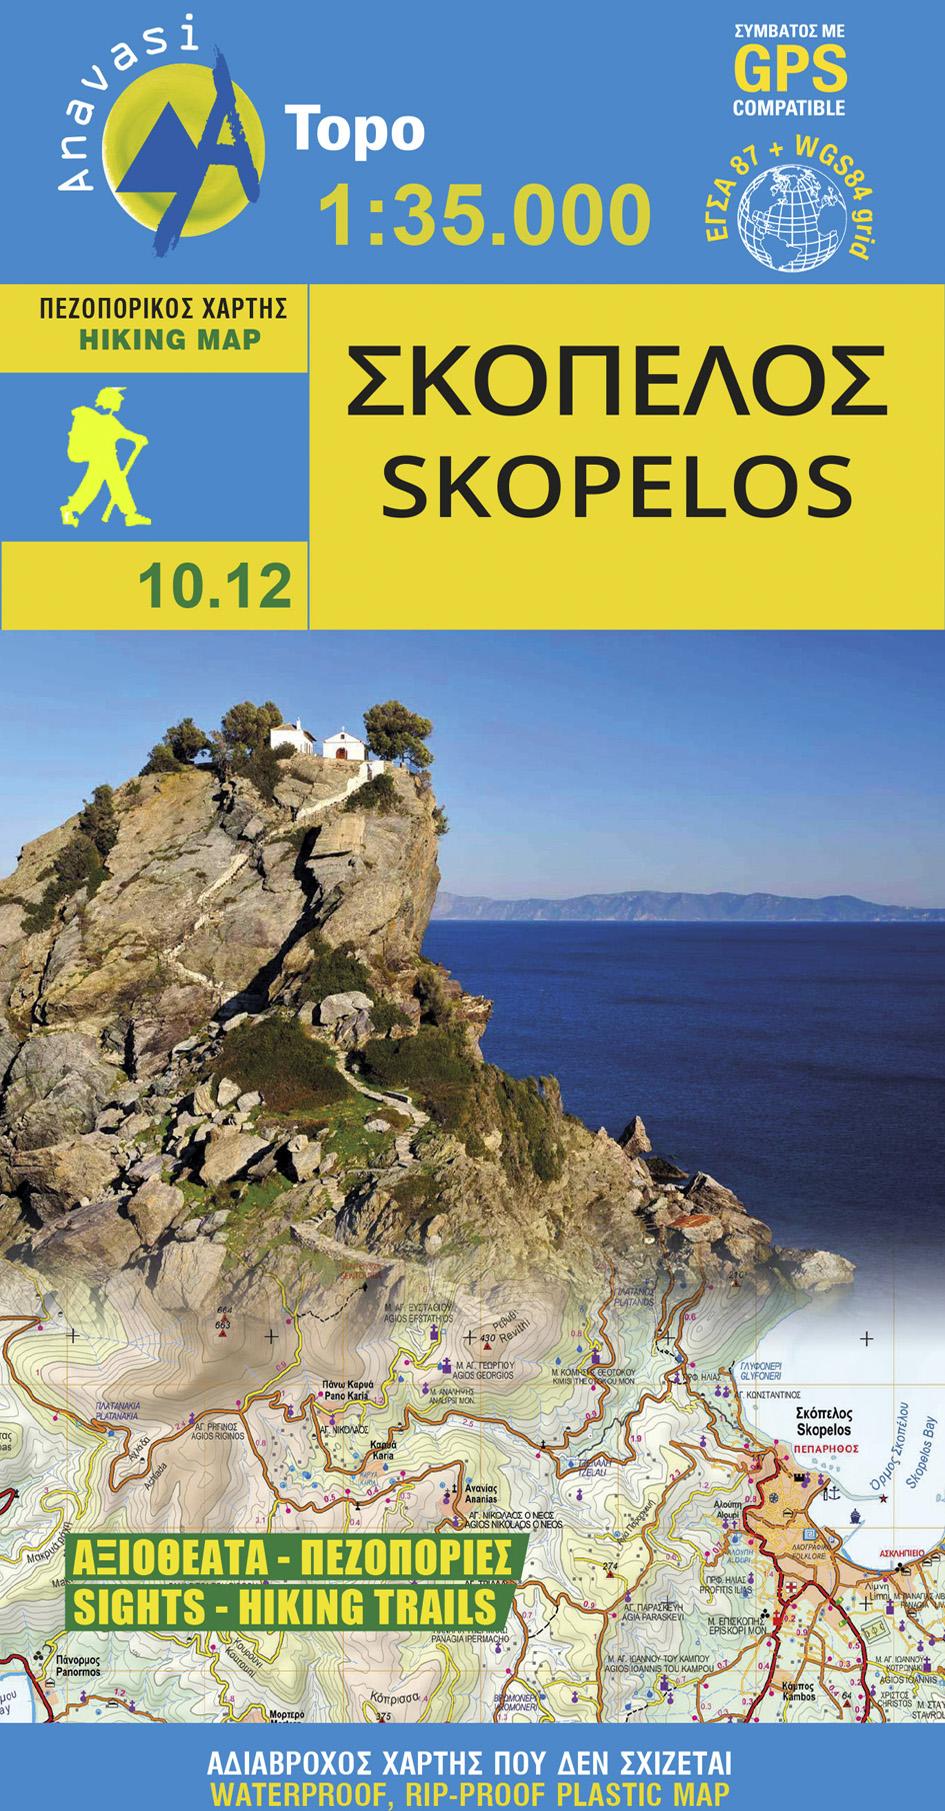 Skopelos • Hiking map 1:25.000